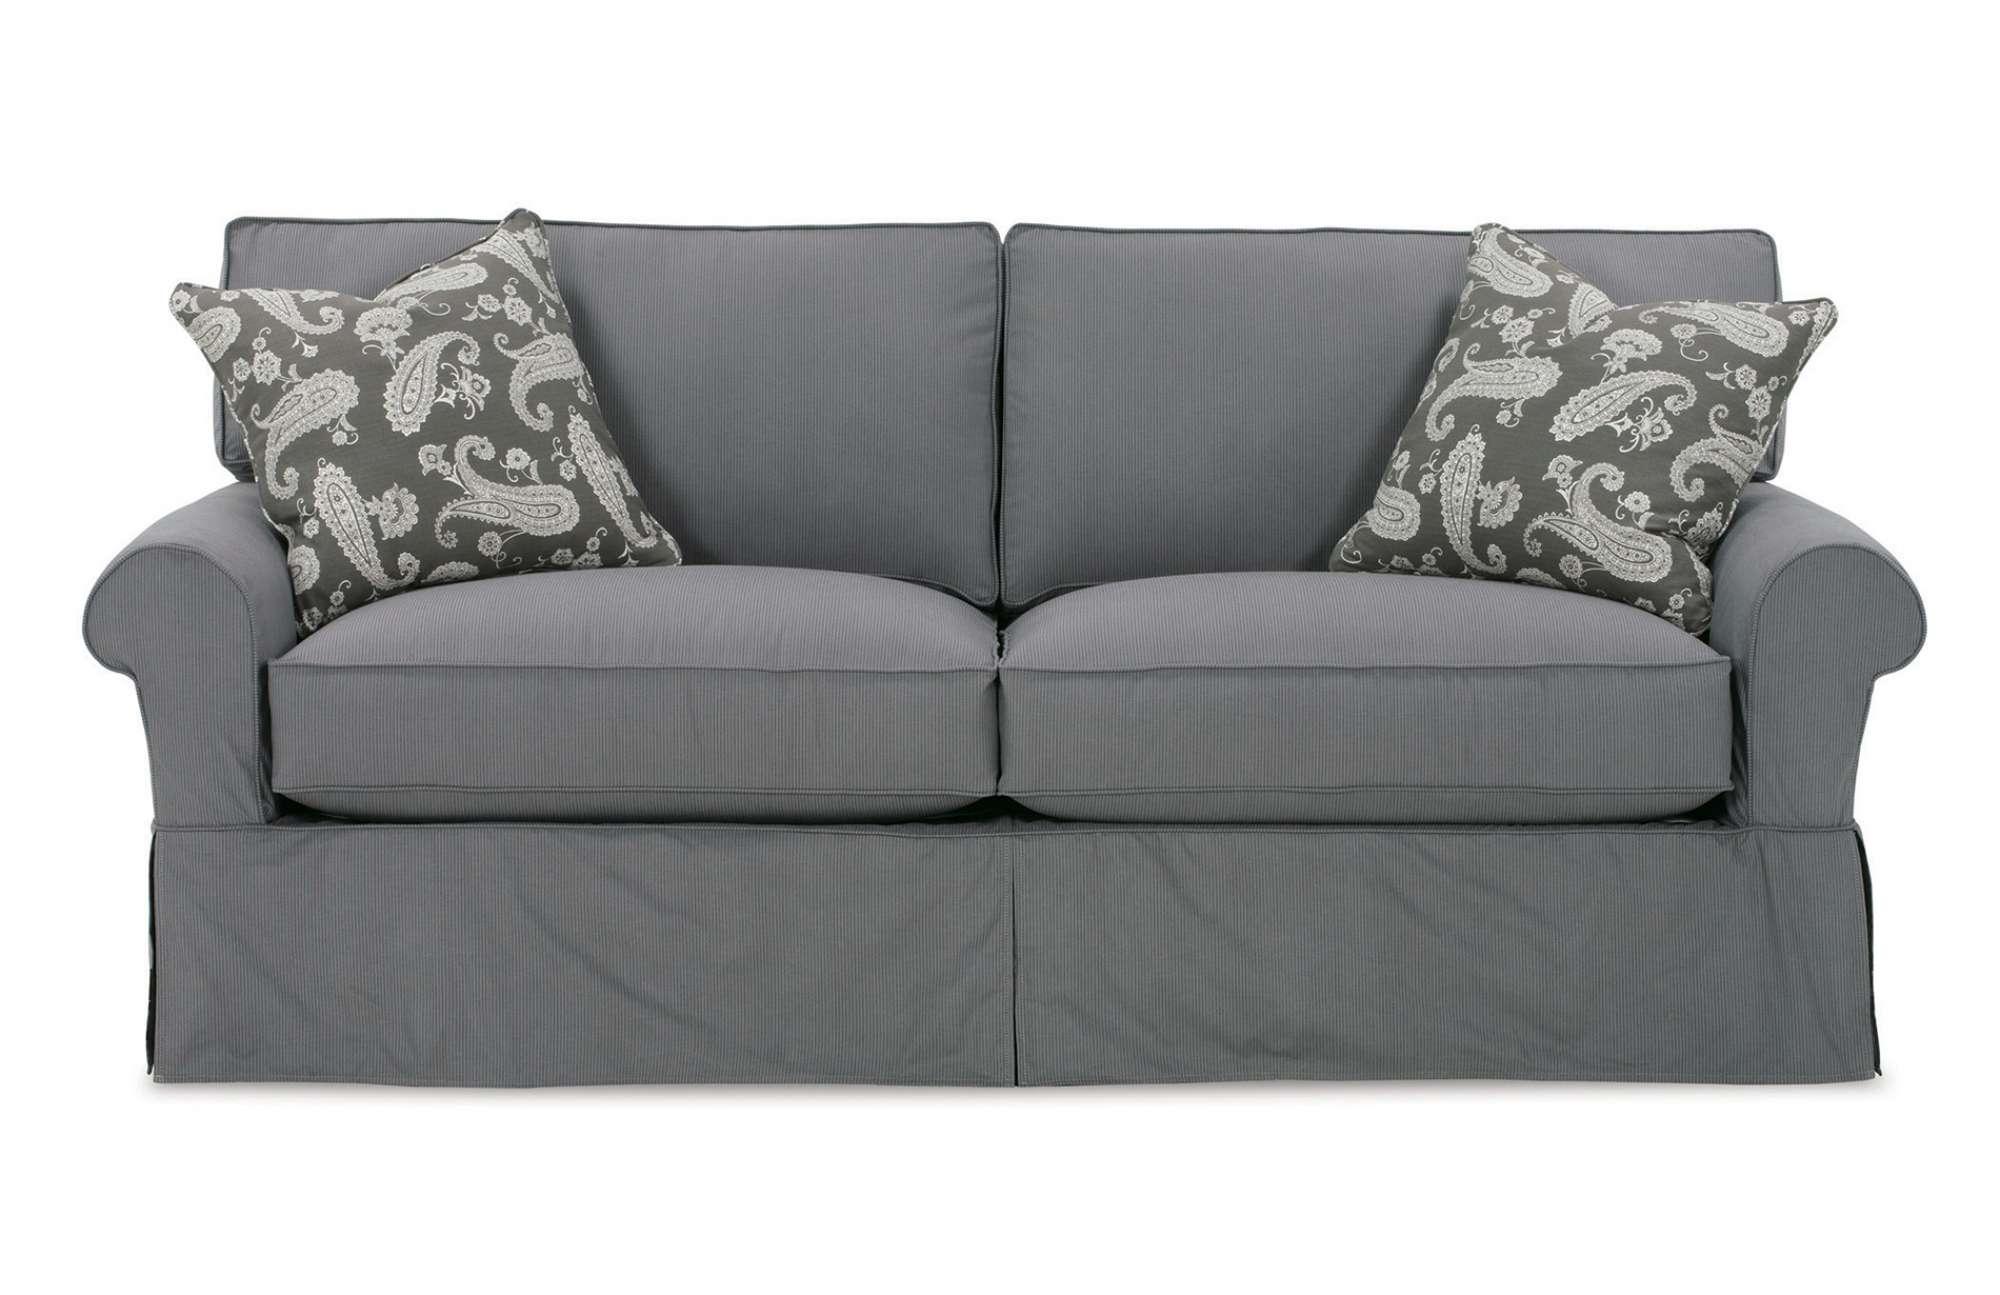 sleeper sofa covers photo - 1